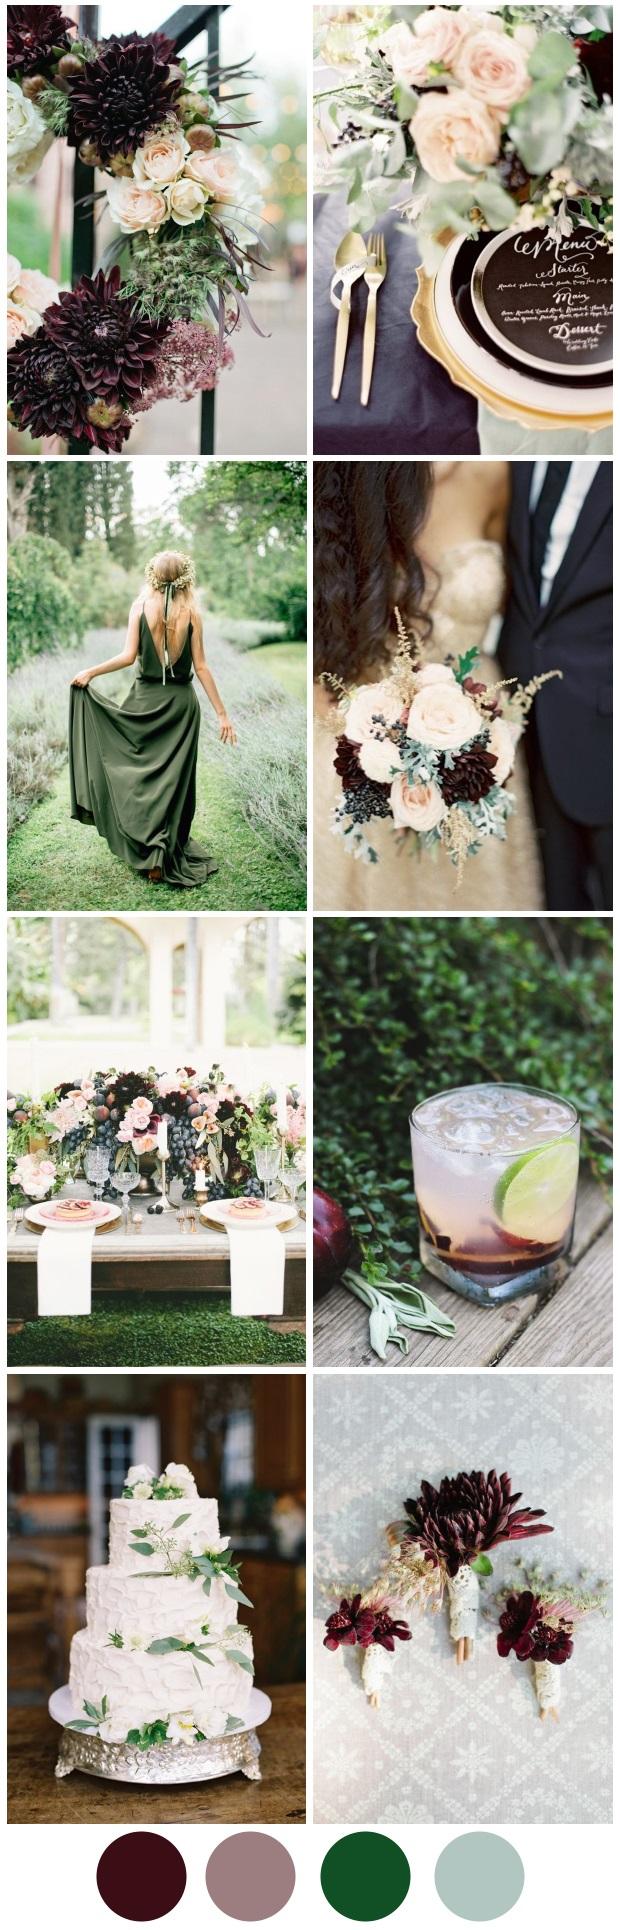 plum-sage-autumn-fall-wedding-color-inspiration-palette